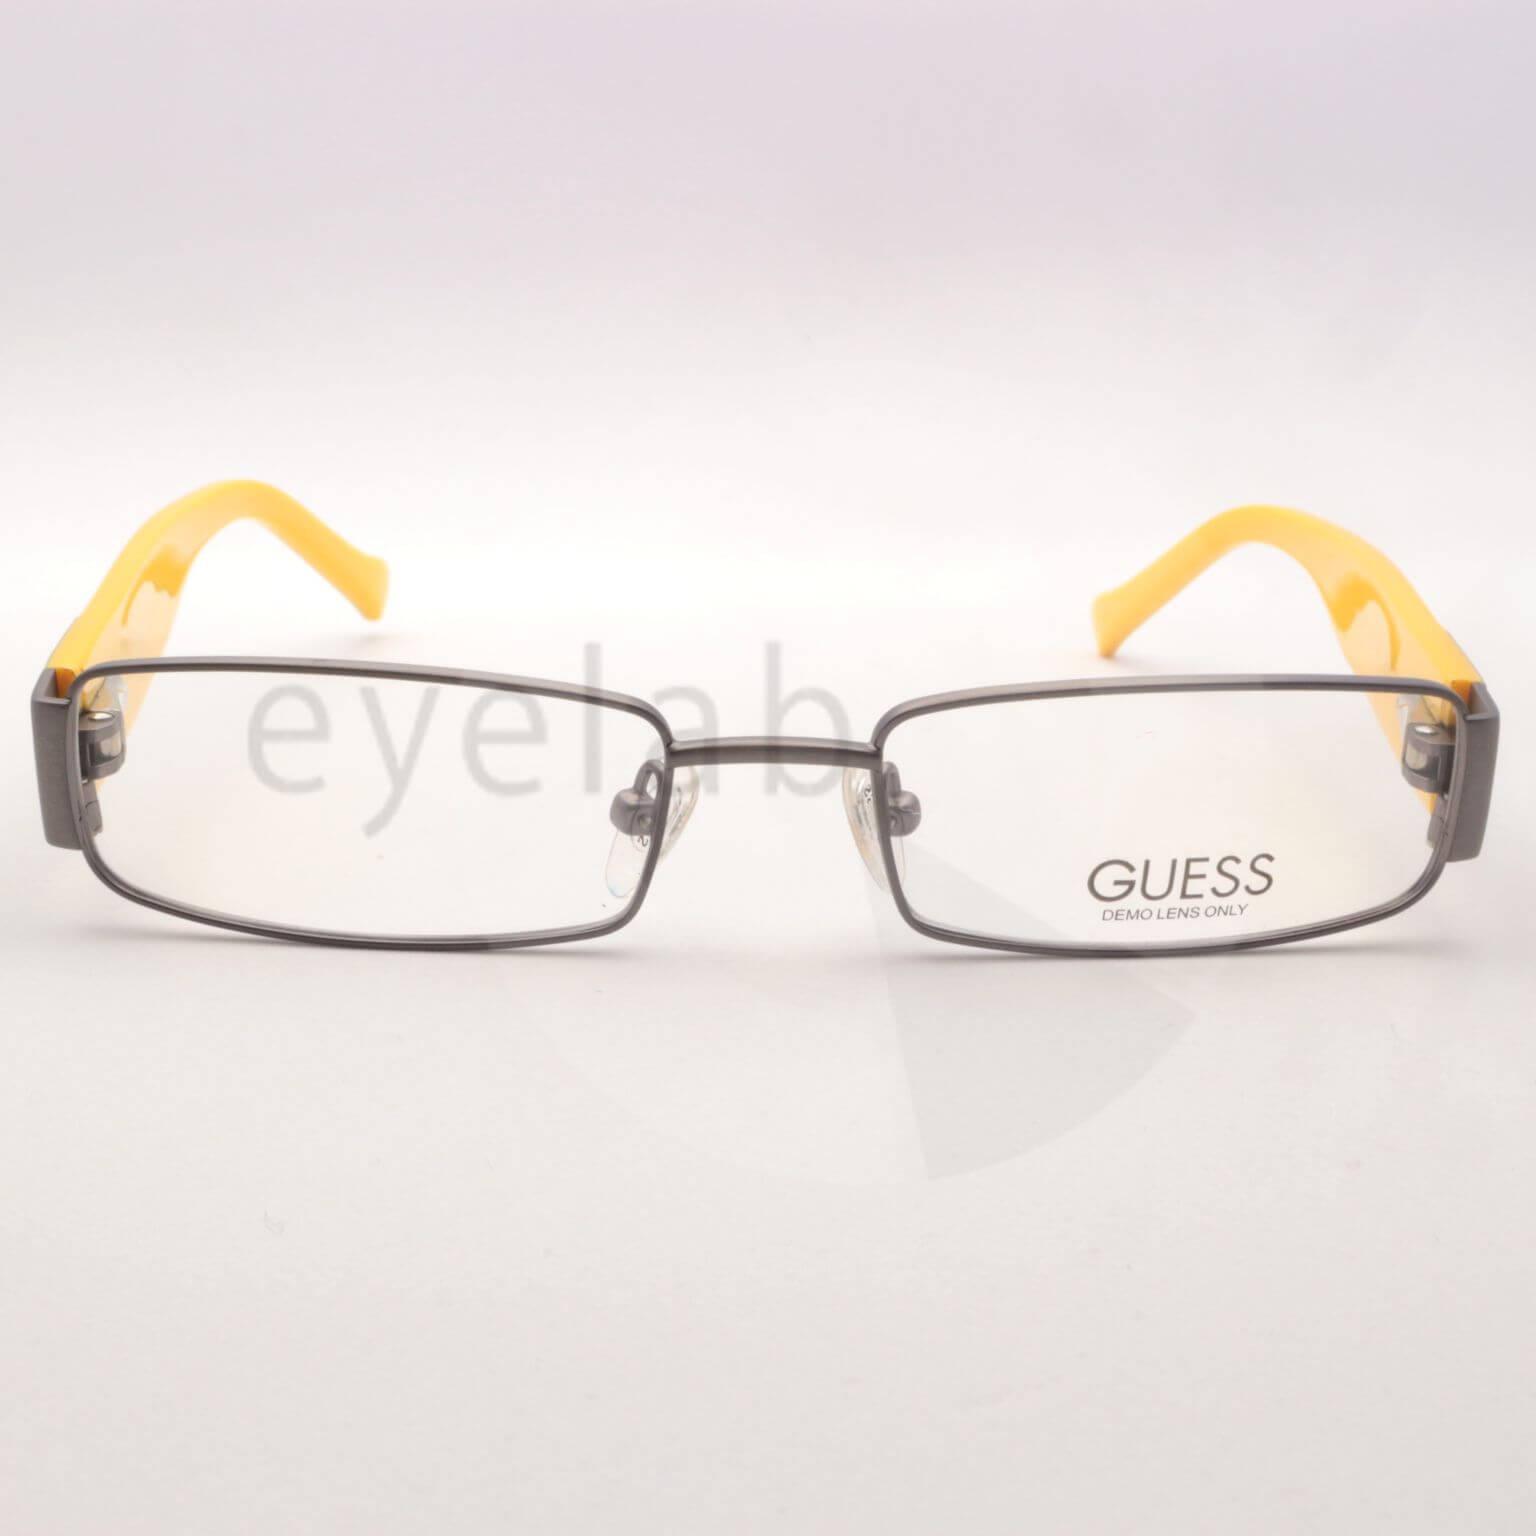 7582f0e401 Guess 9022 GUNBL 48 ~ Eyelab